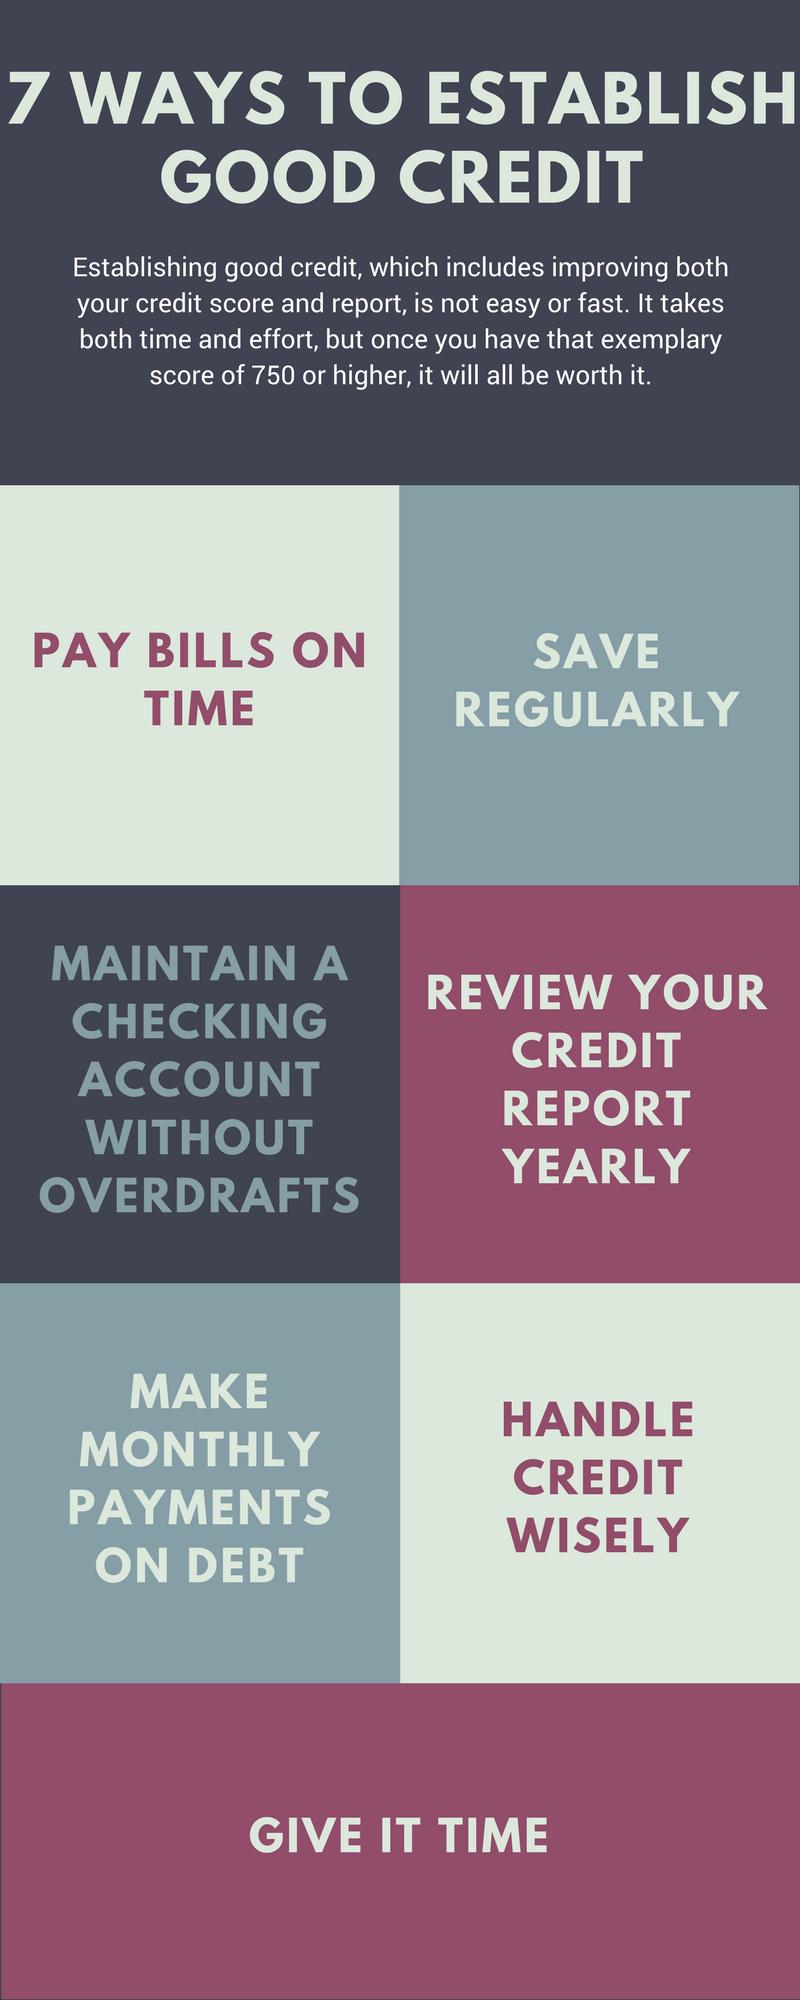 7 ways to establish good credit.png